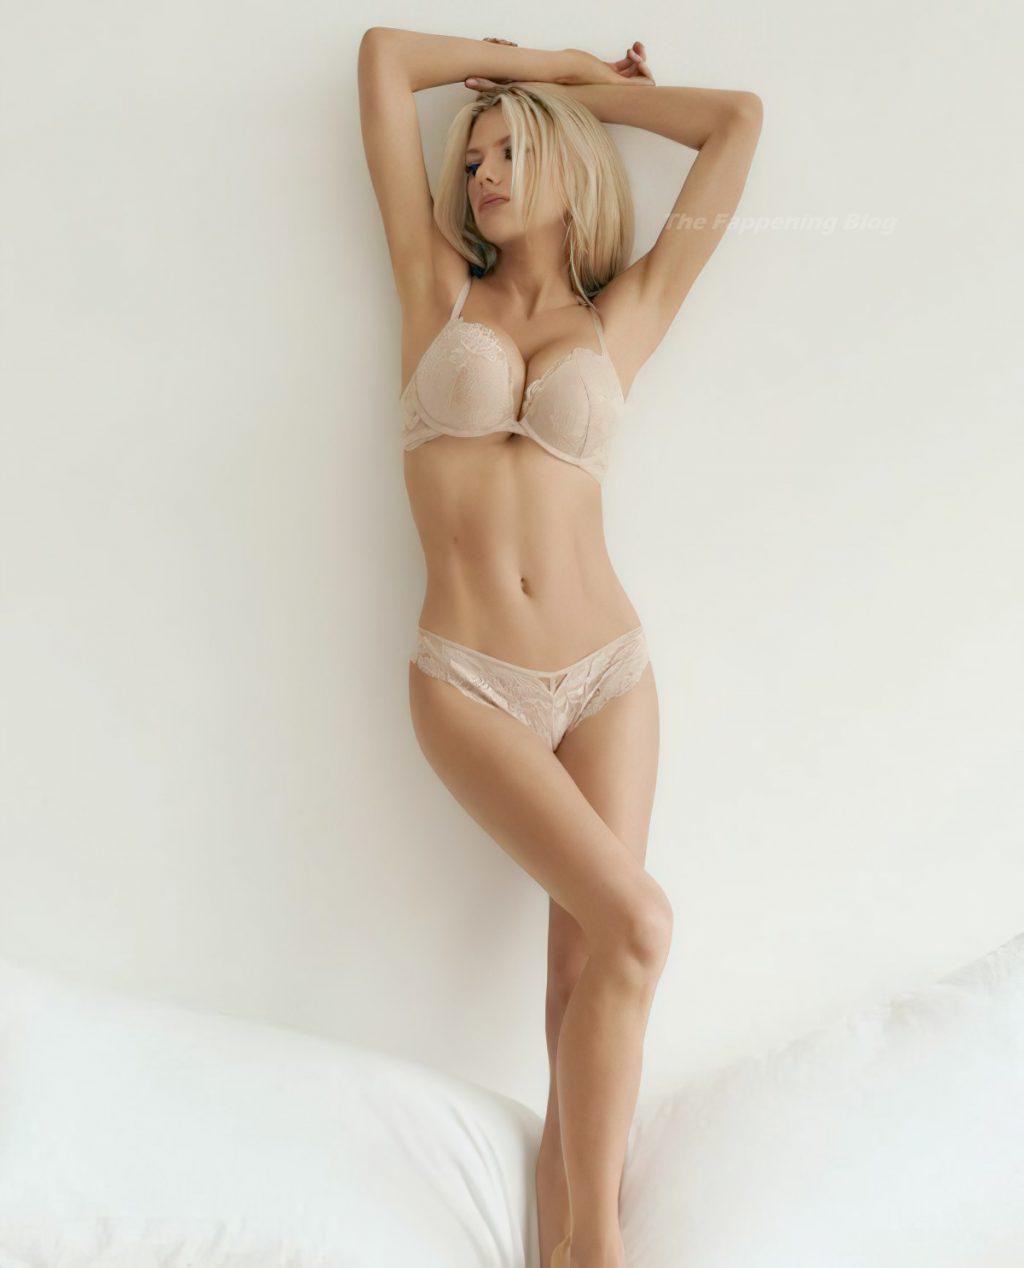 Charlotte McKinney Poses For Lingerie Brand La Senza (1 Photo)